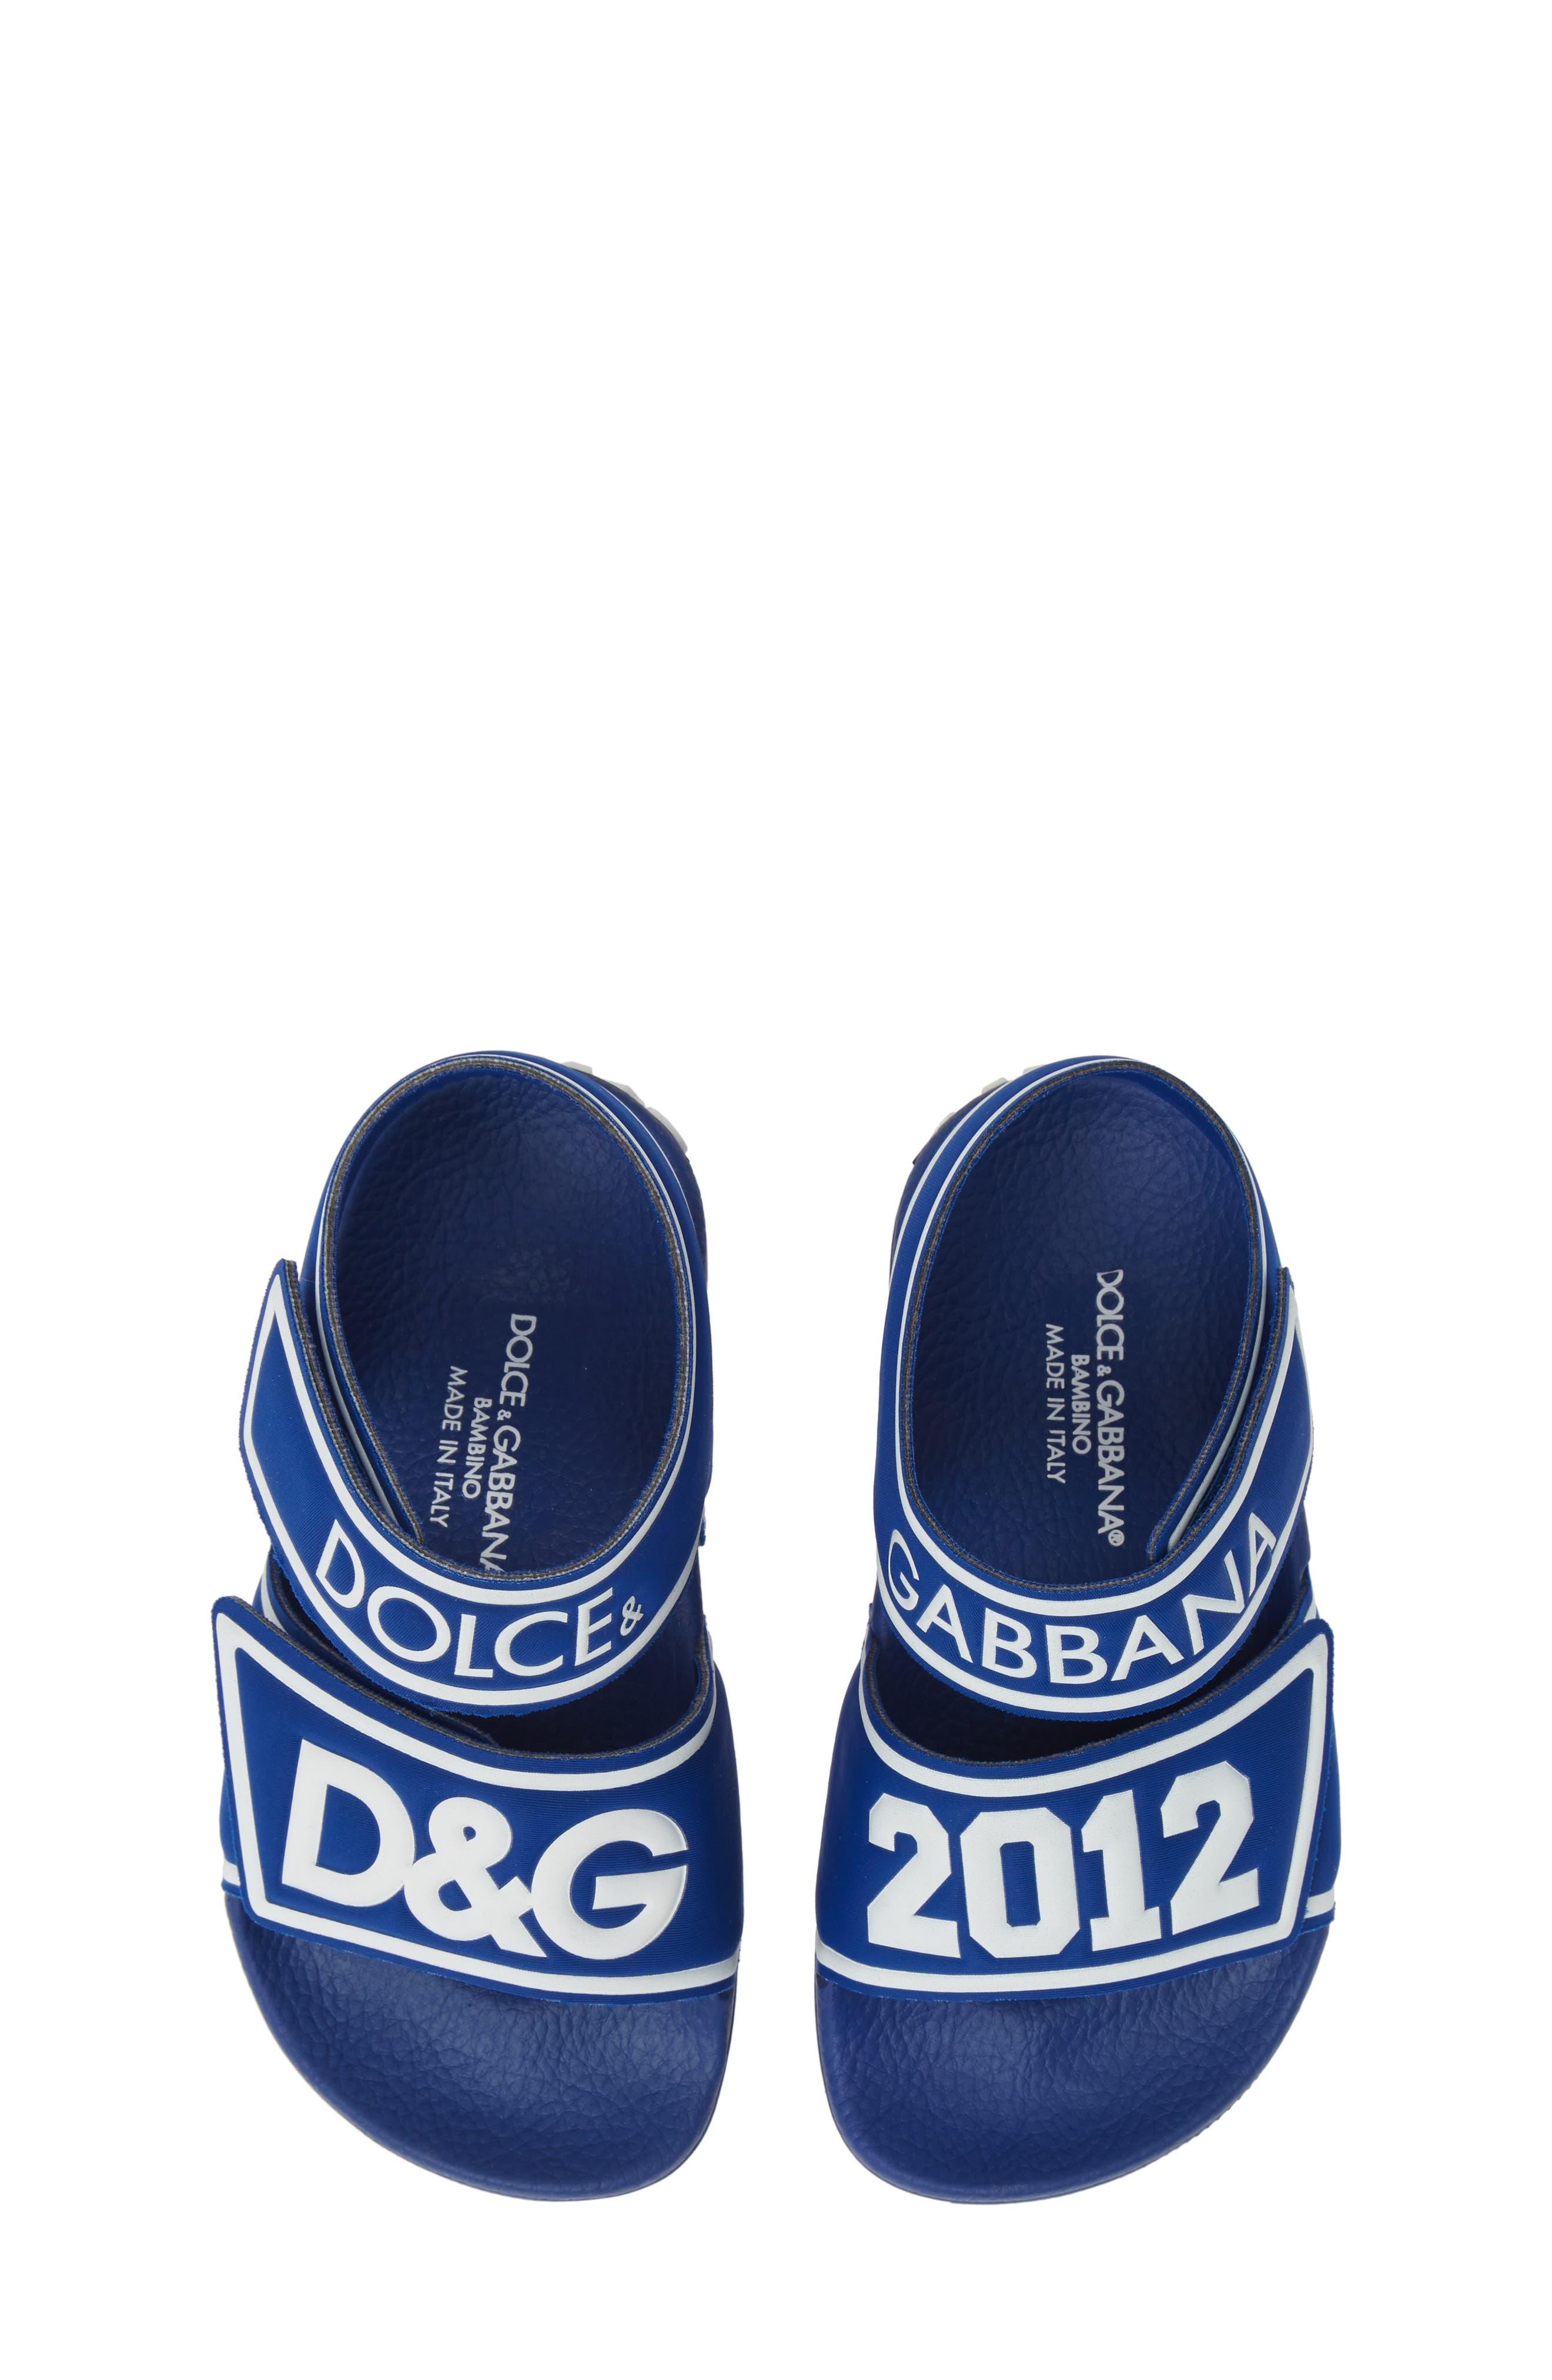 DOLCE&GABBANA, Jelly Fisherman Sandal, Main thumbnail 1, color, BLUE/ WHITE